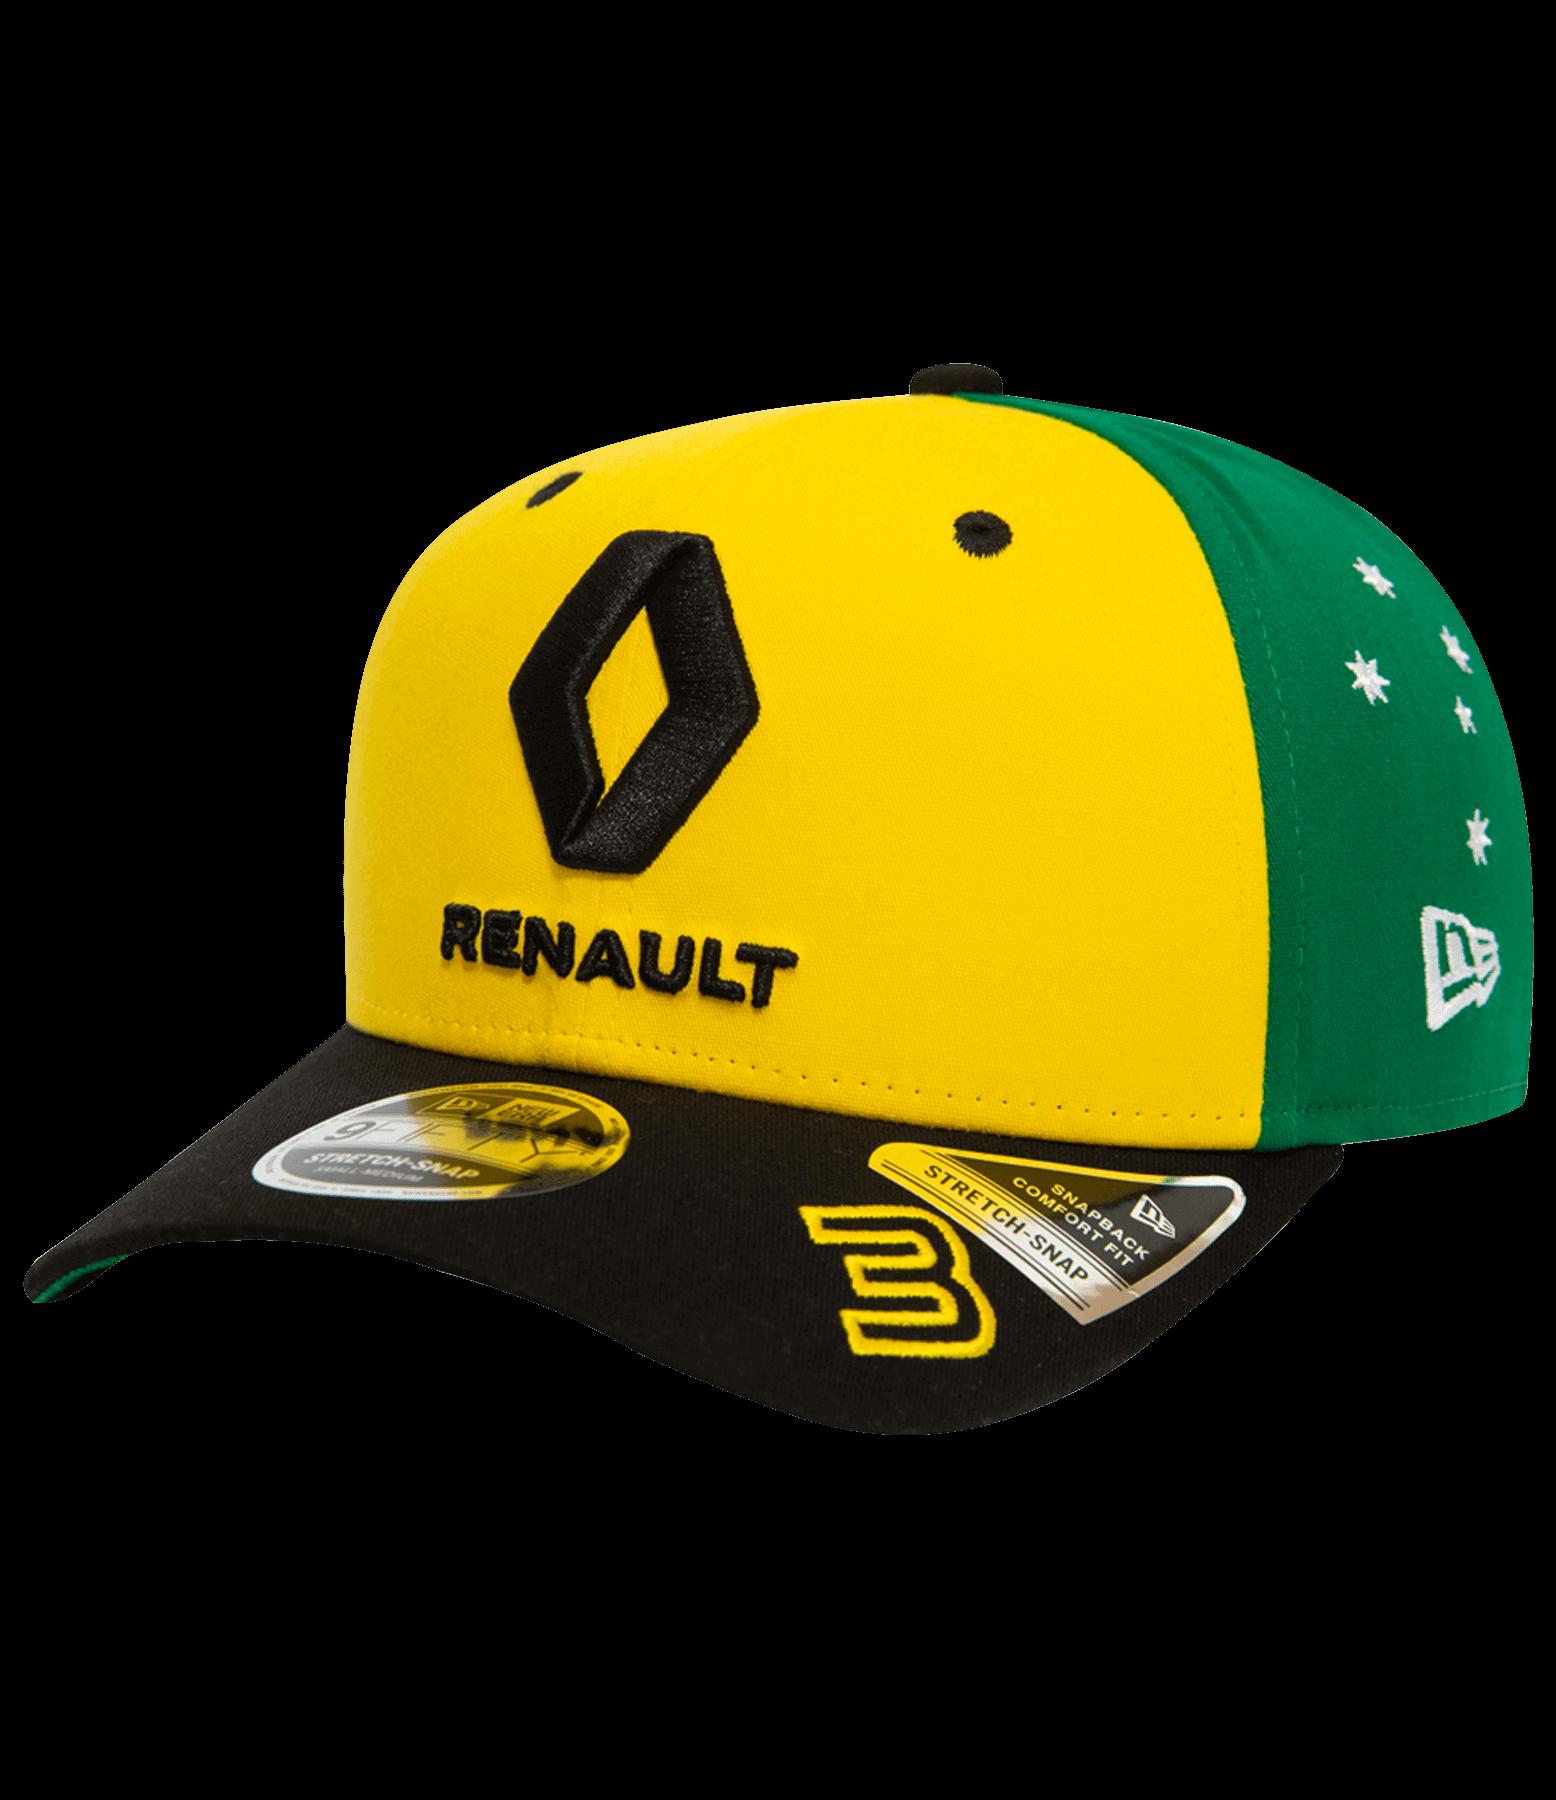 Daniel Ricciardo 2019 official cap - Australian GP special edition